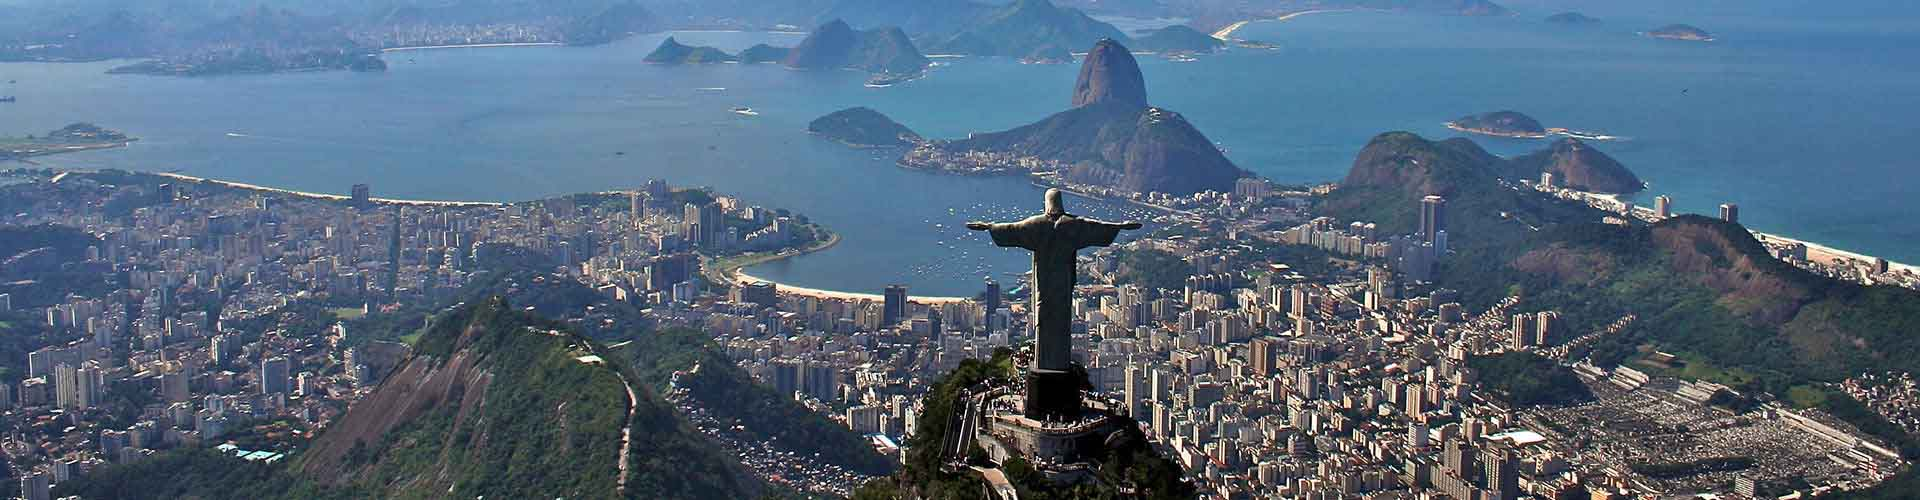 Rio de Janeiro - Hôtels dans le quartier de Copacabana. Cartes pour Rio de Janeiro, photos et commentaires pour chaque hôtel à Rio de Janeiro.